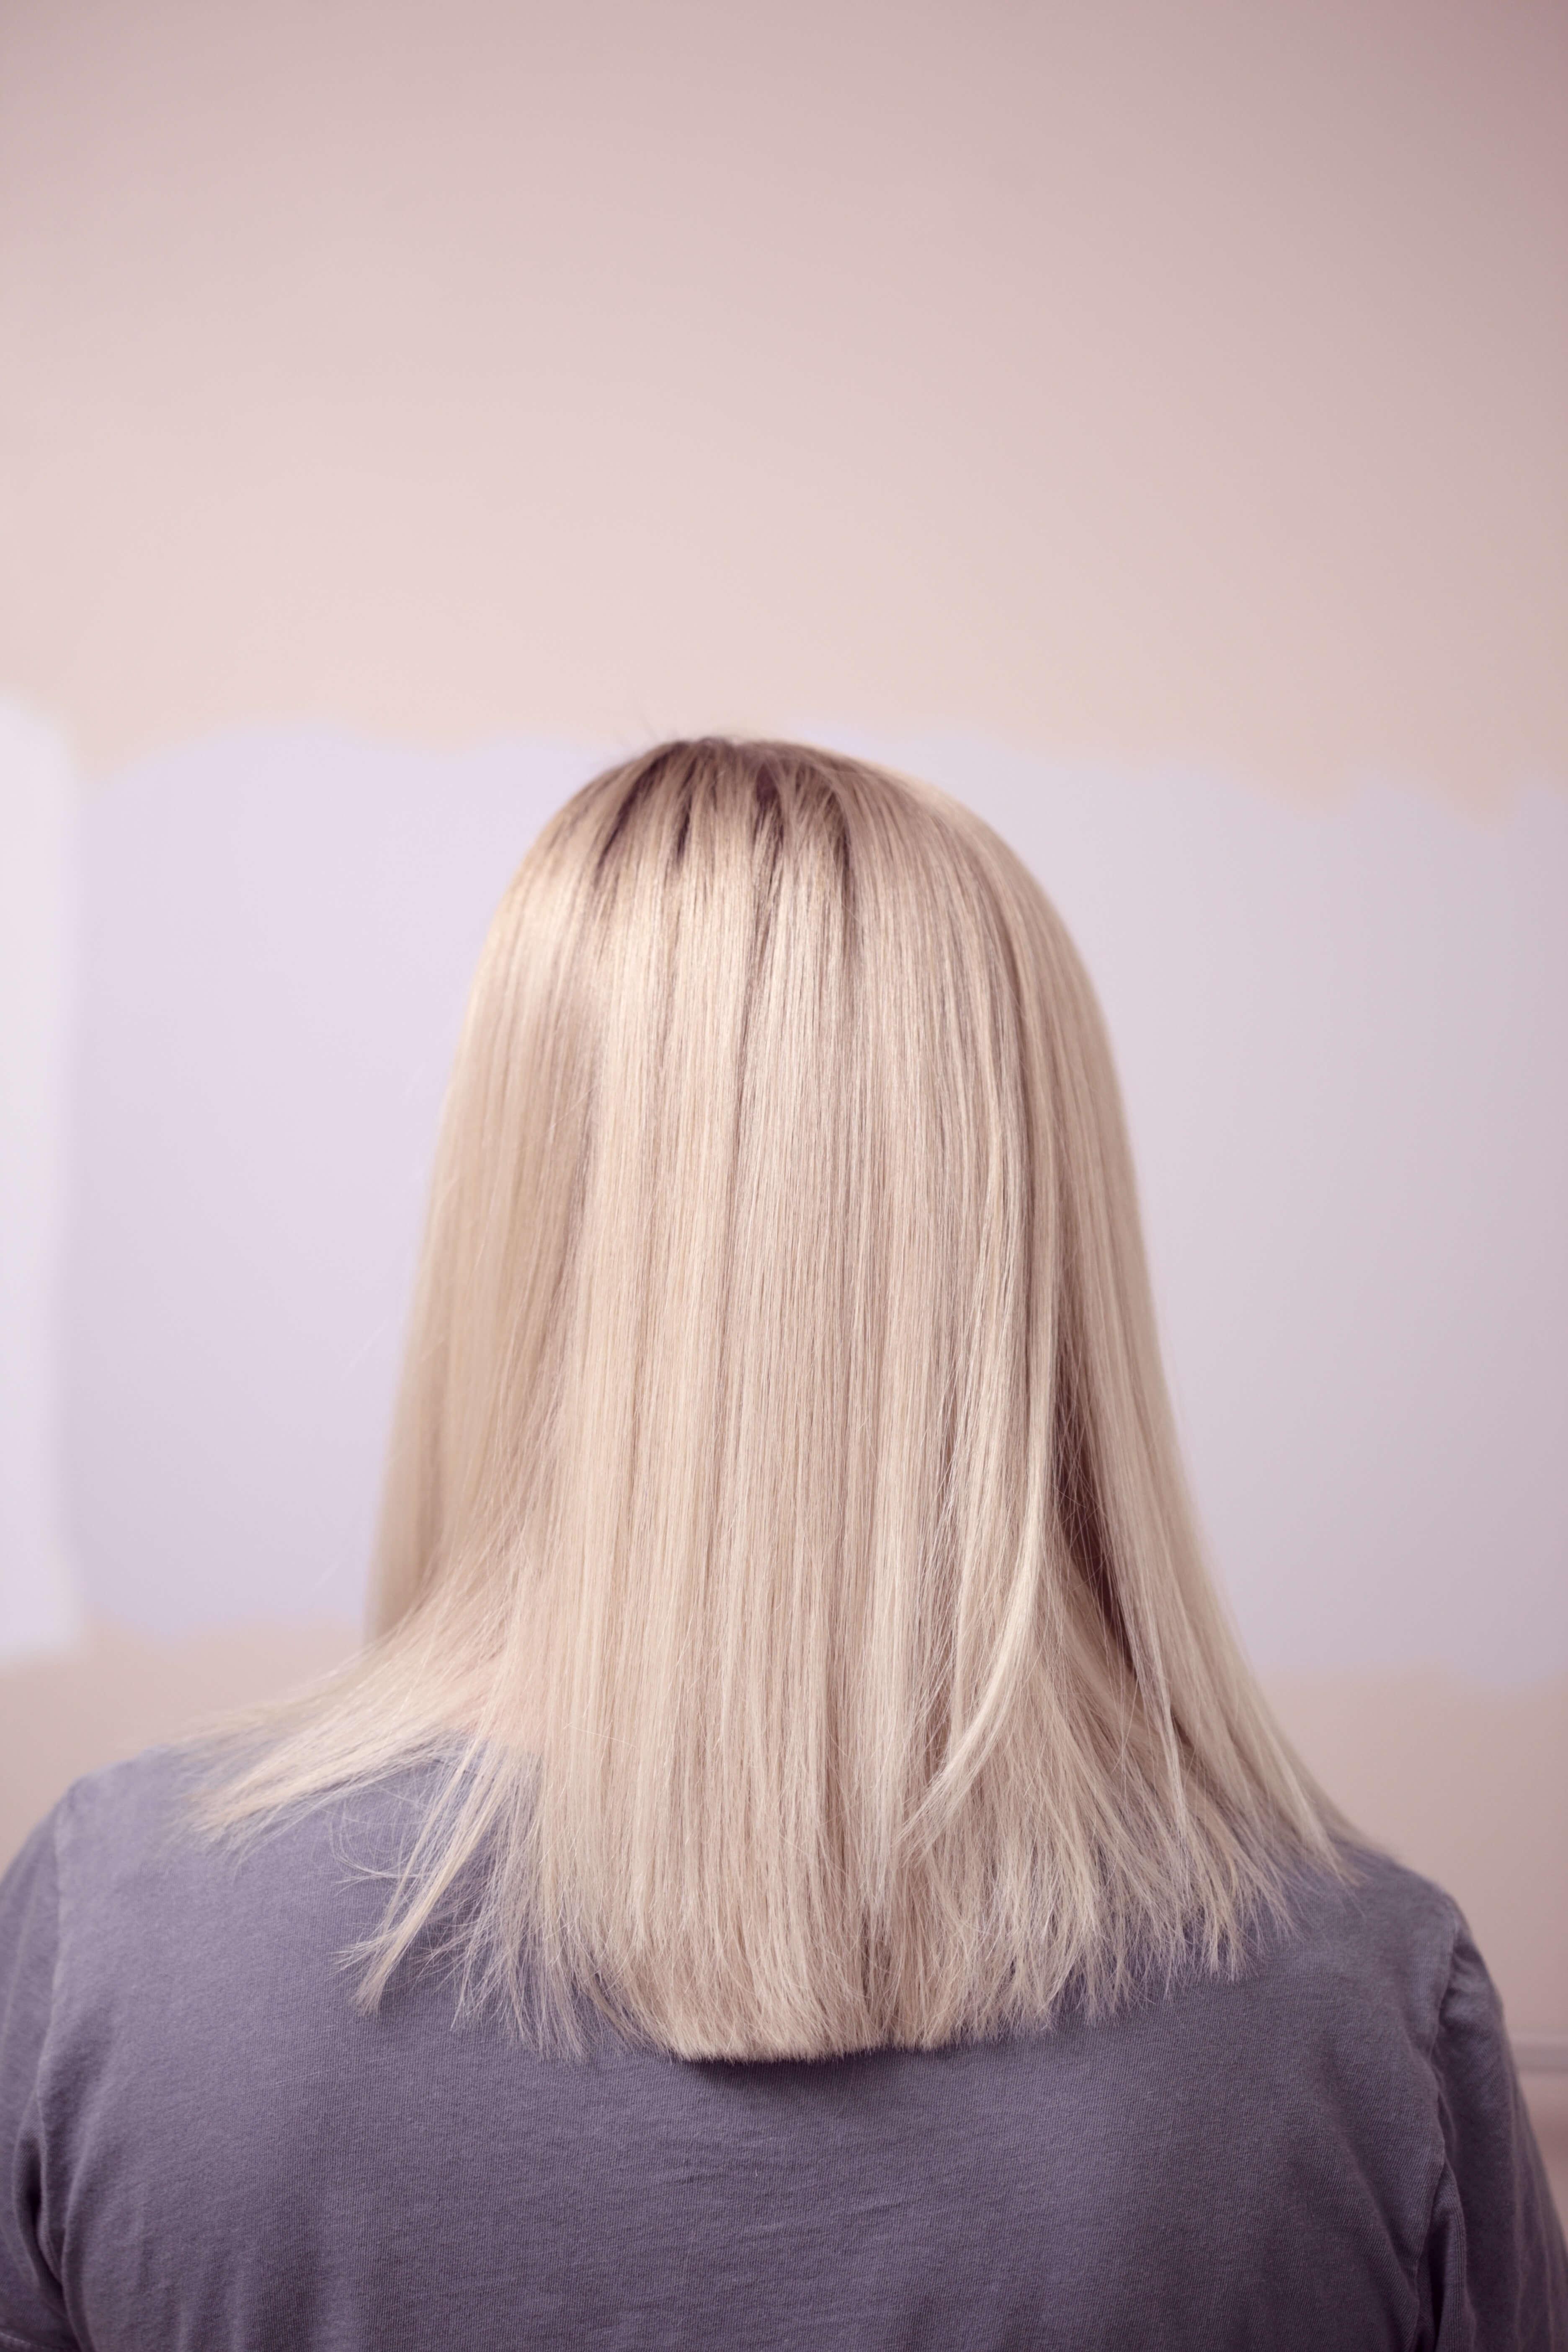 blont har med silverschampo